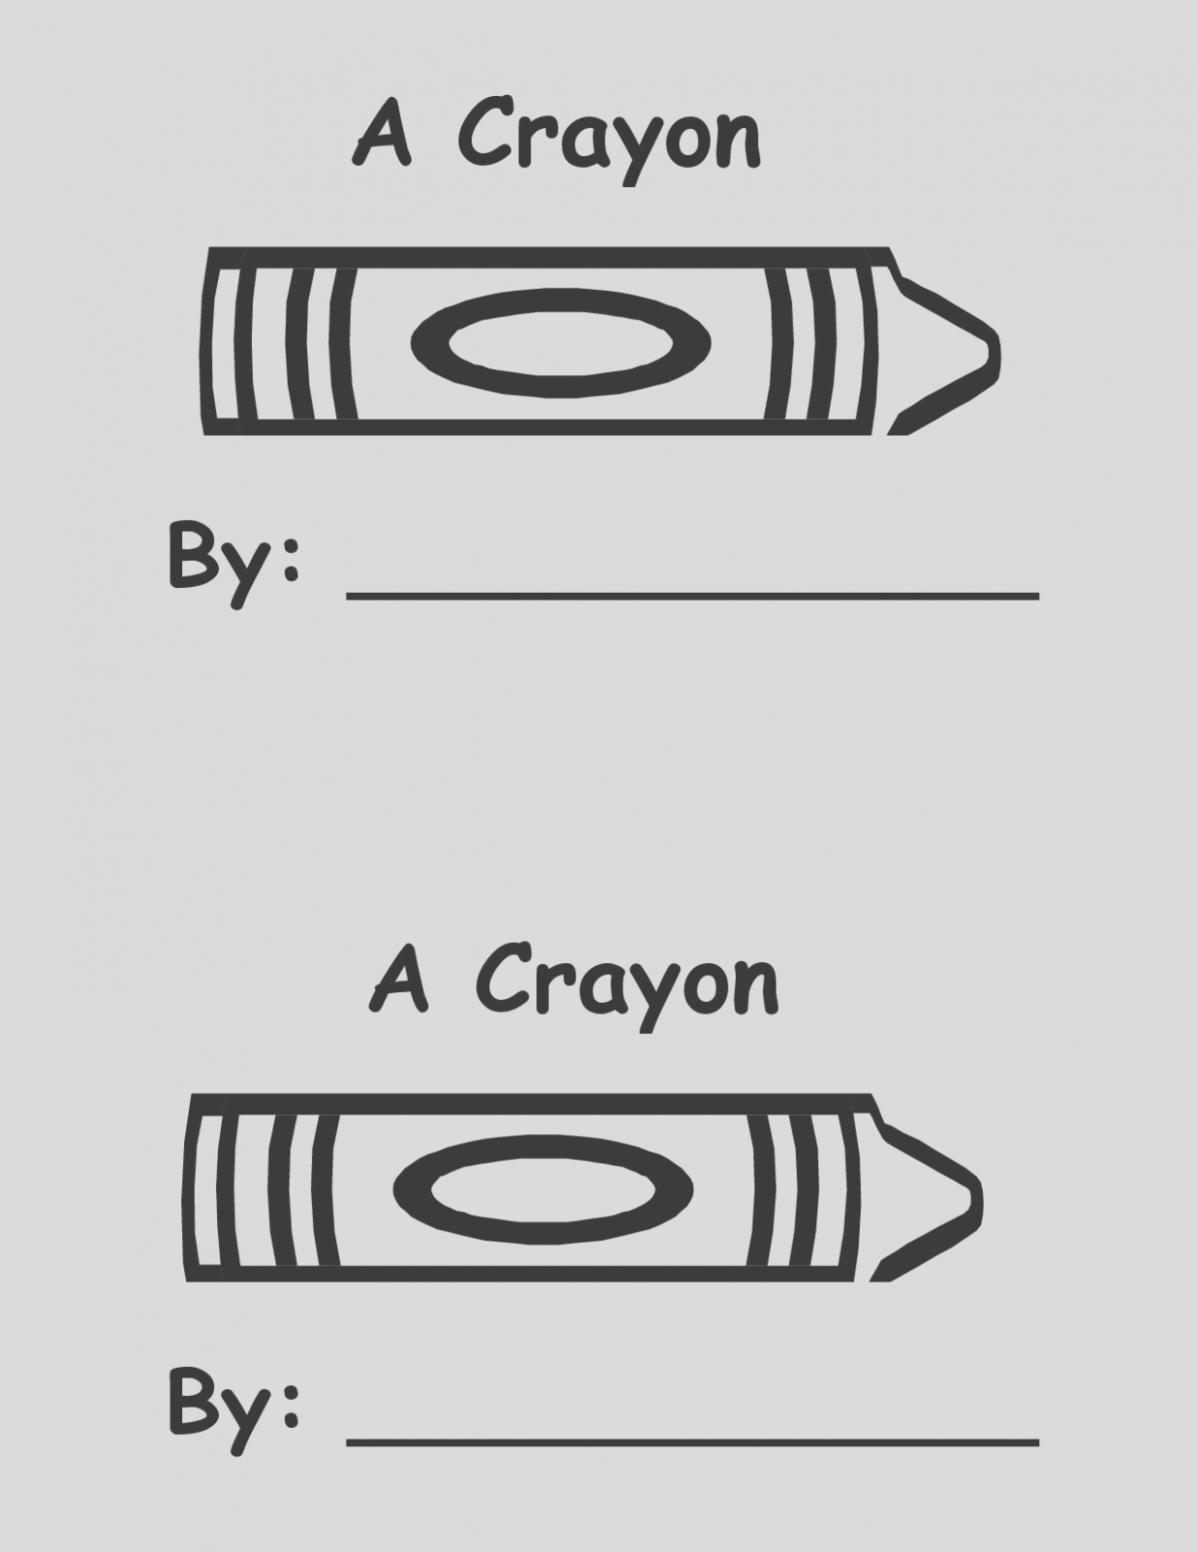 Geeky Crayon Template Printable | Ellen Blog Inside Crayon Labels Template